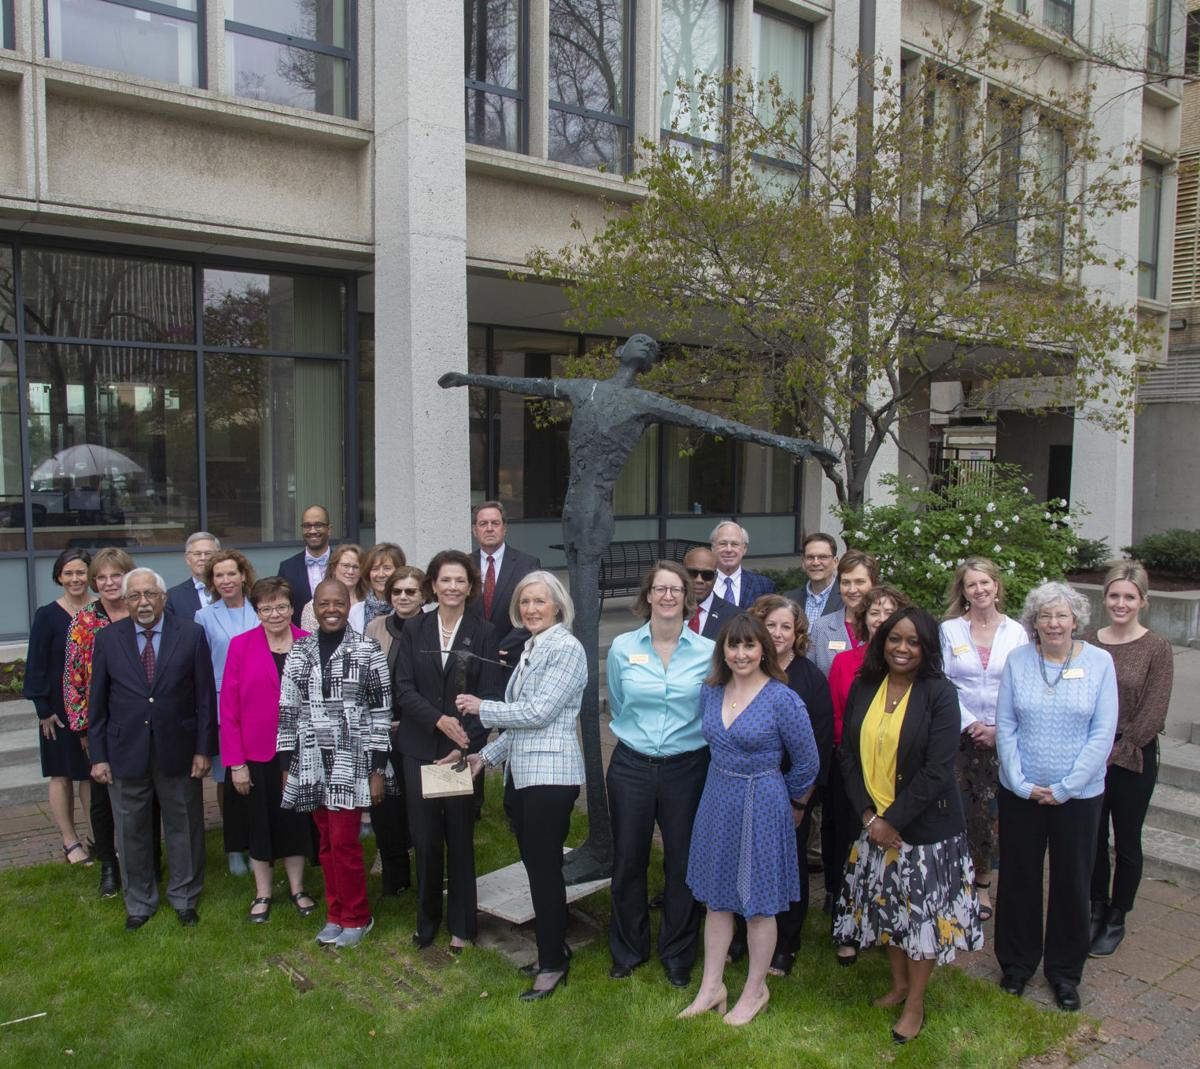 Charity Award presentation in LCF Garden